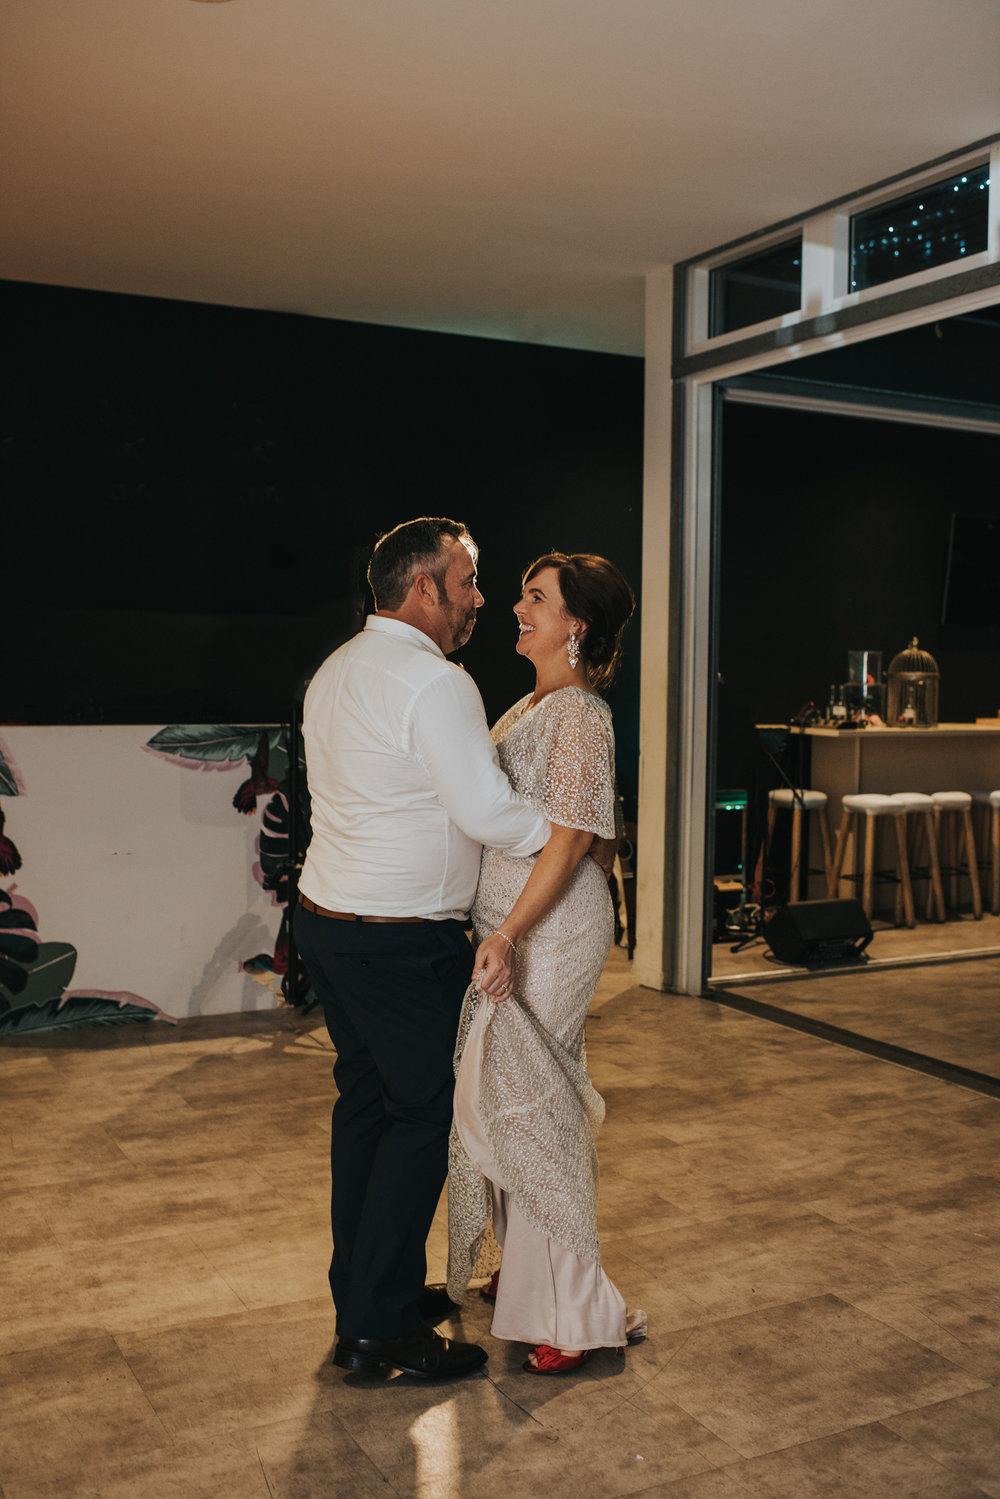 Brisbane Engagement Photographer | Wedding-Elopement Photography-80.jpg